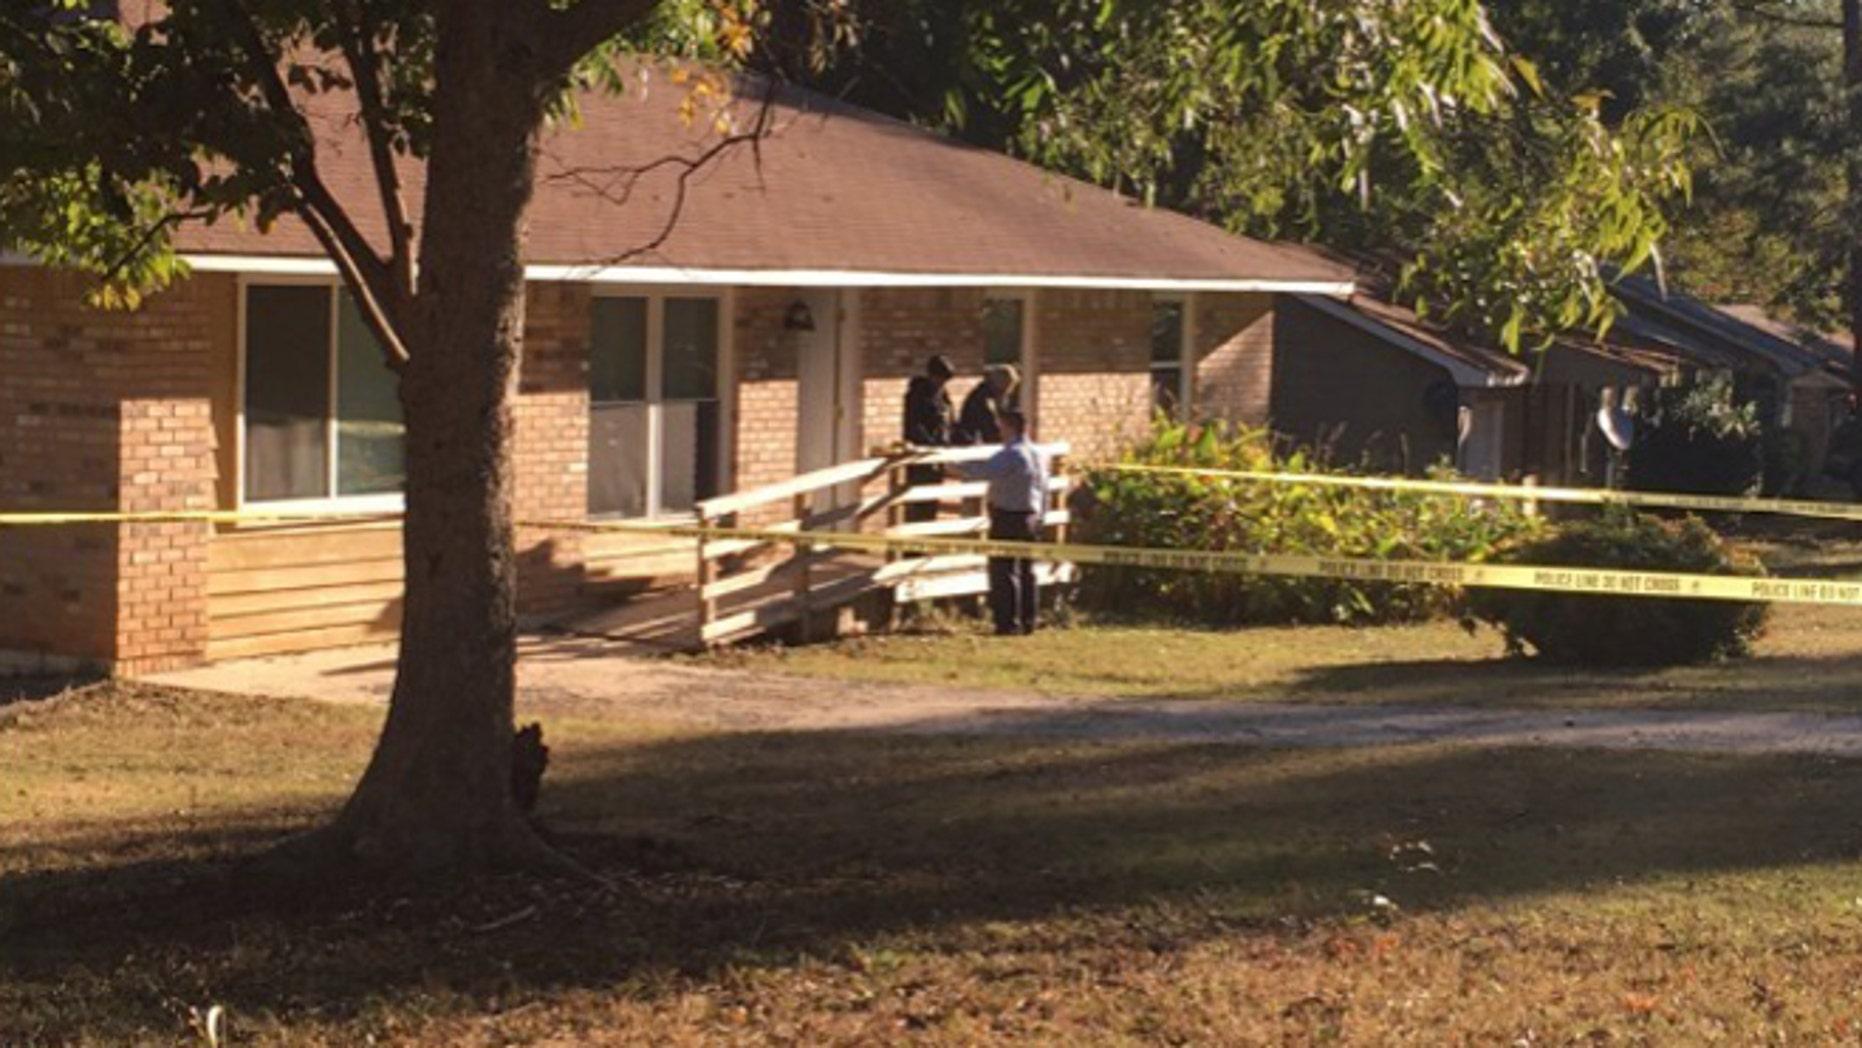 Police outside a home in Jonesboro, Georgia, where two children were shot and killed by an intruder. (Fox 5 Atlanta)